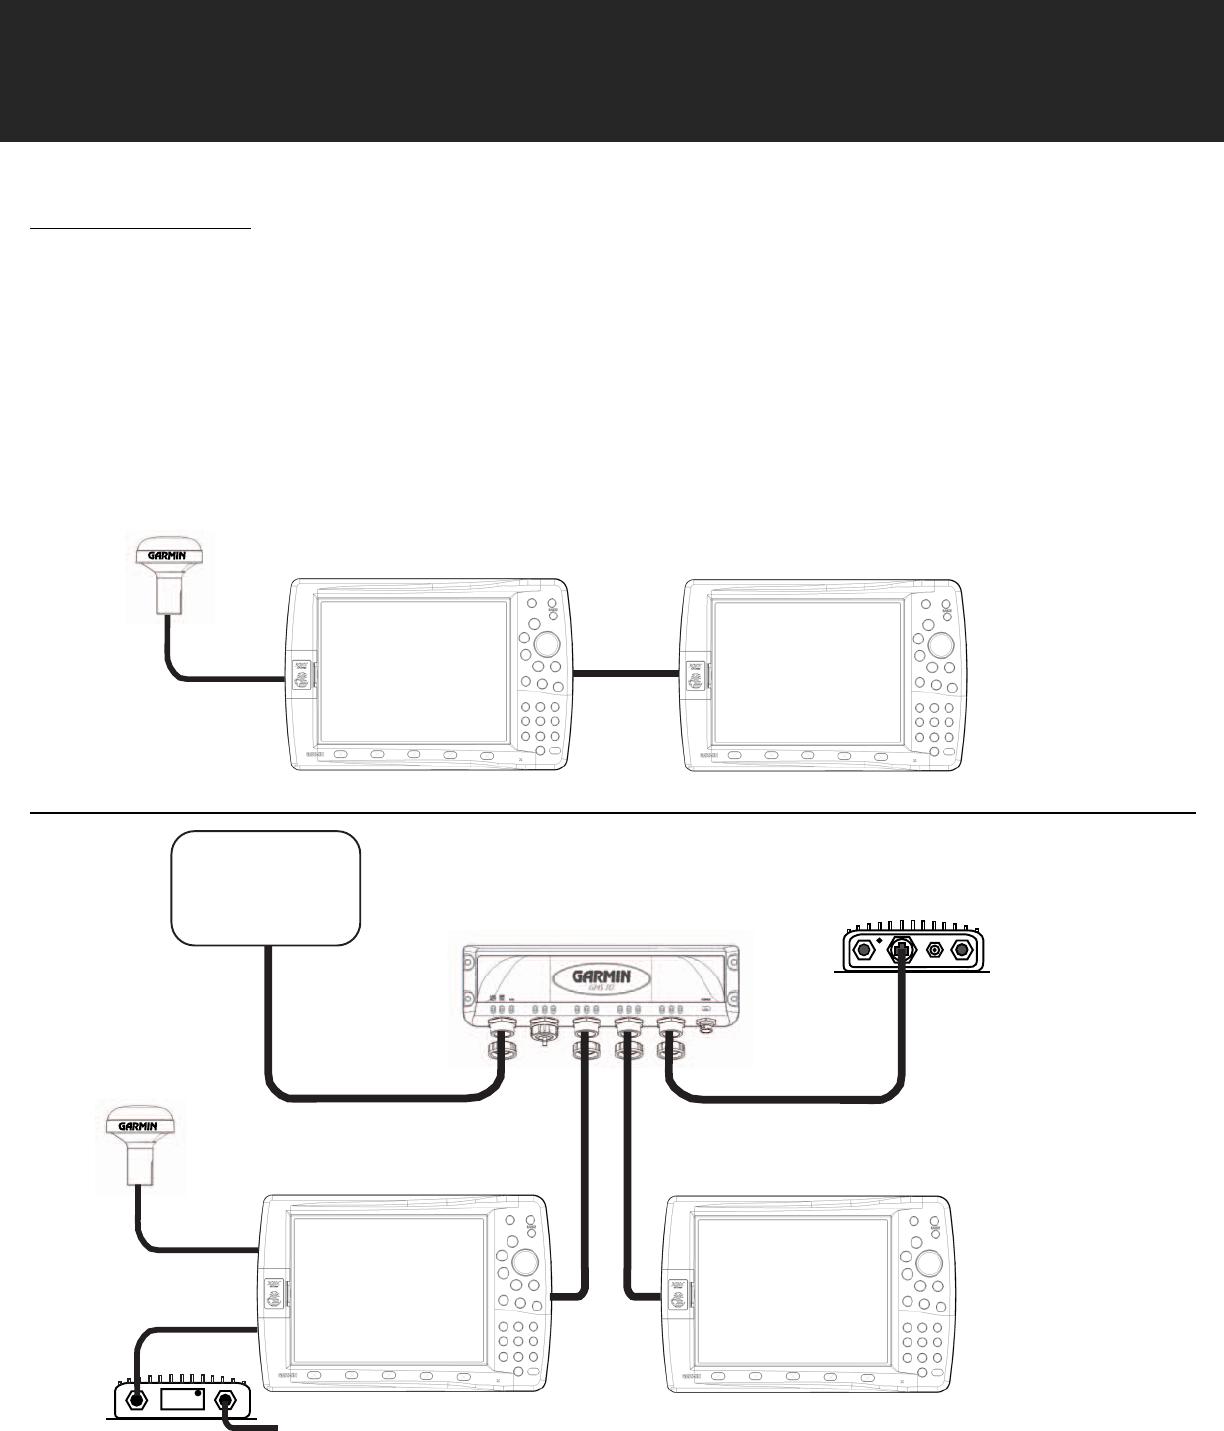 hight resolution of garmin quest wiring diagram wiring library garmin wiring diagram 94 sv garmin quest wiring diagram